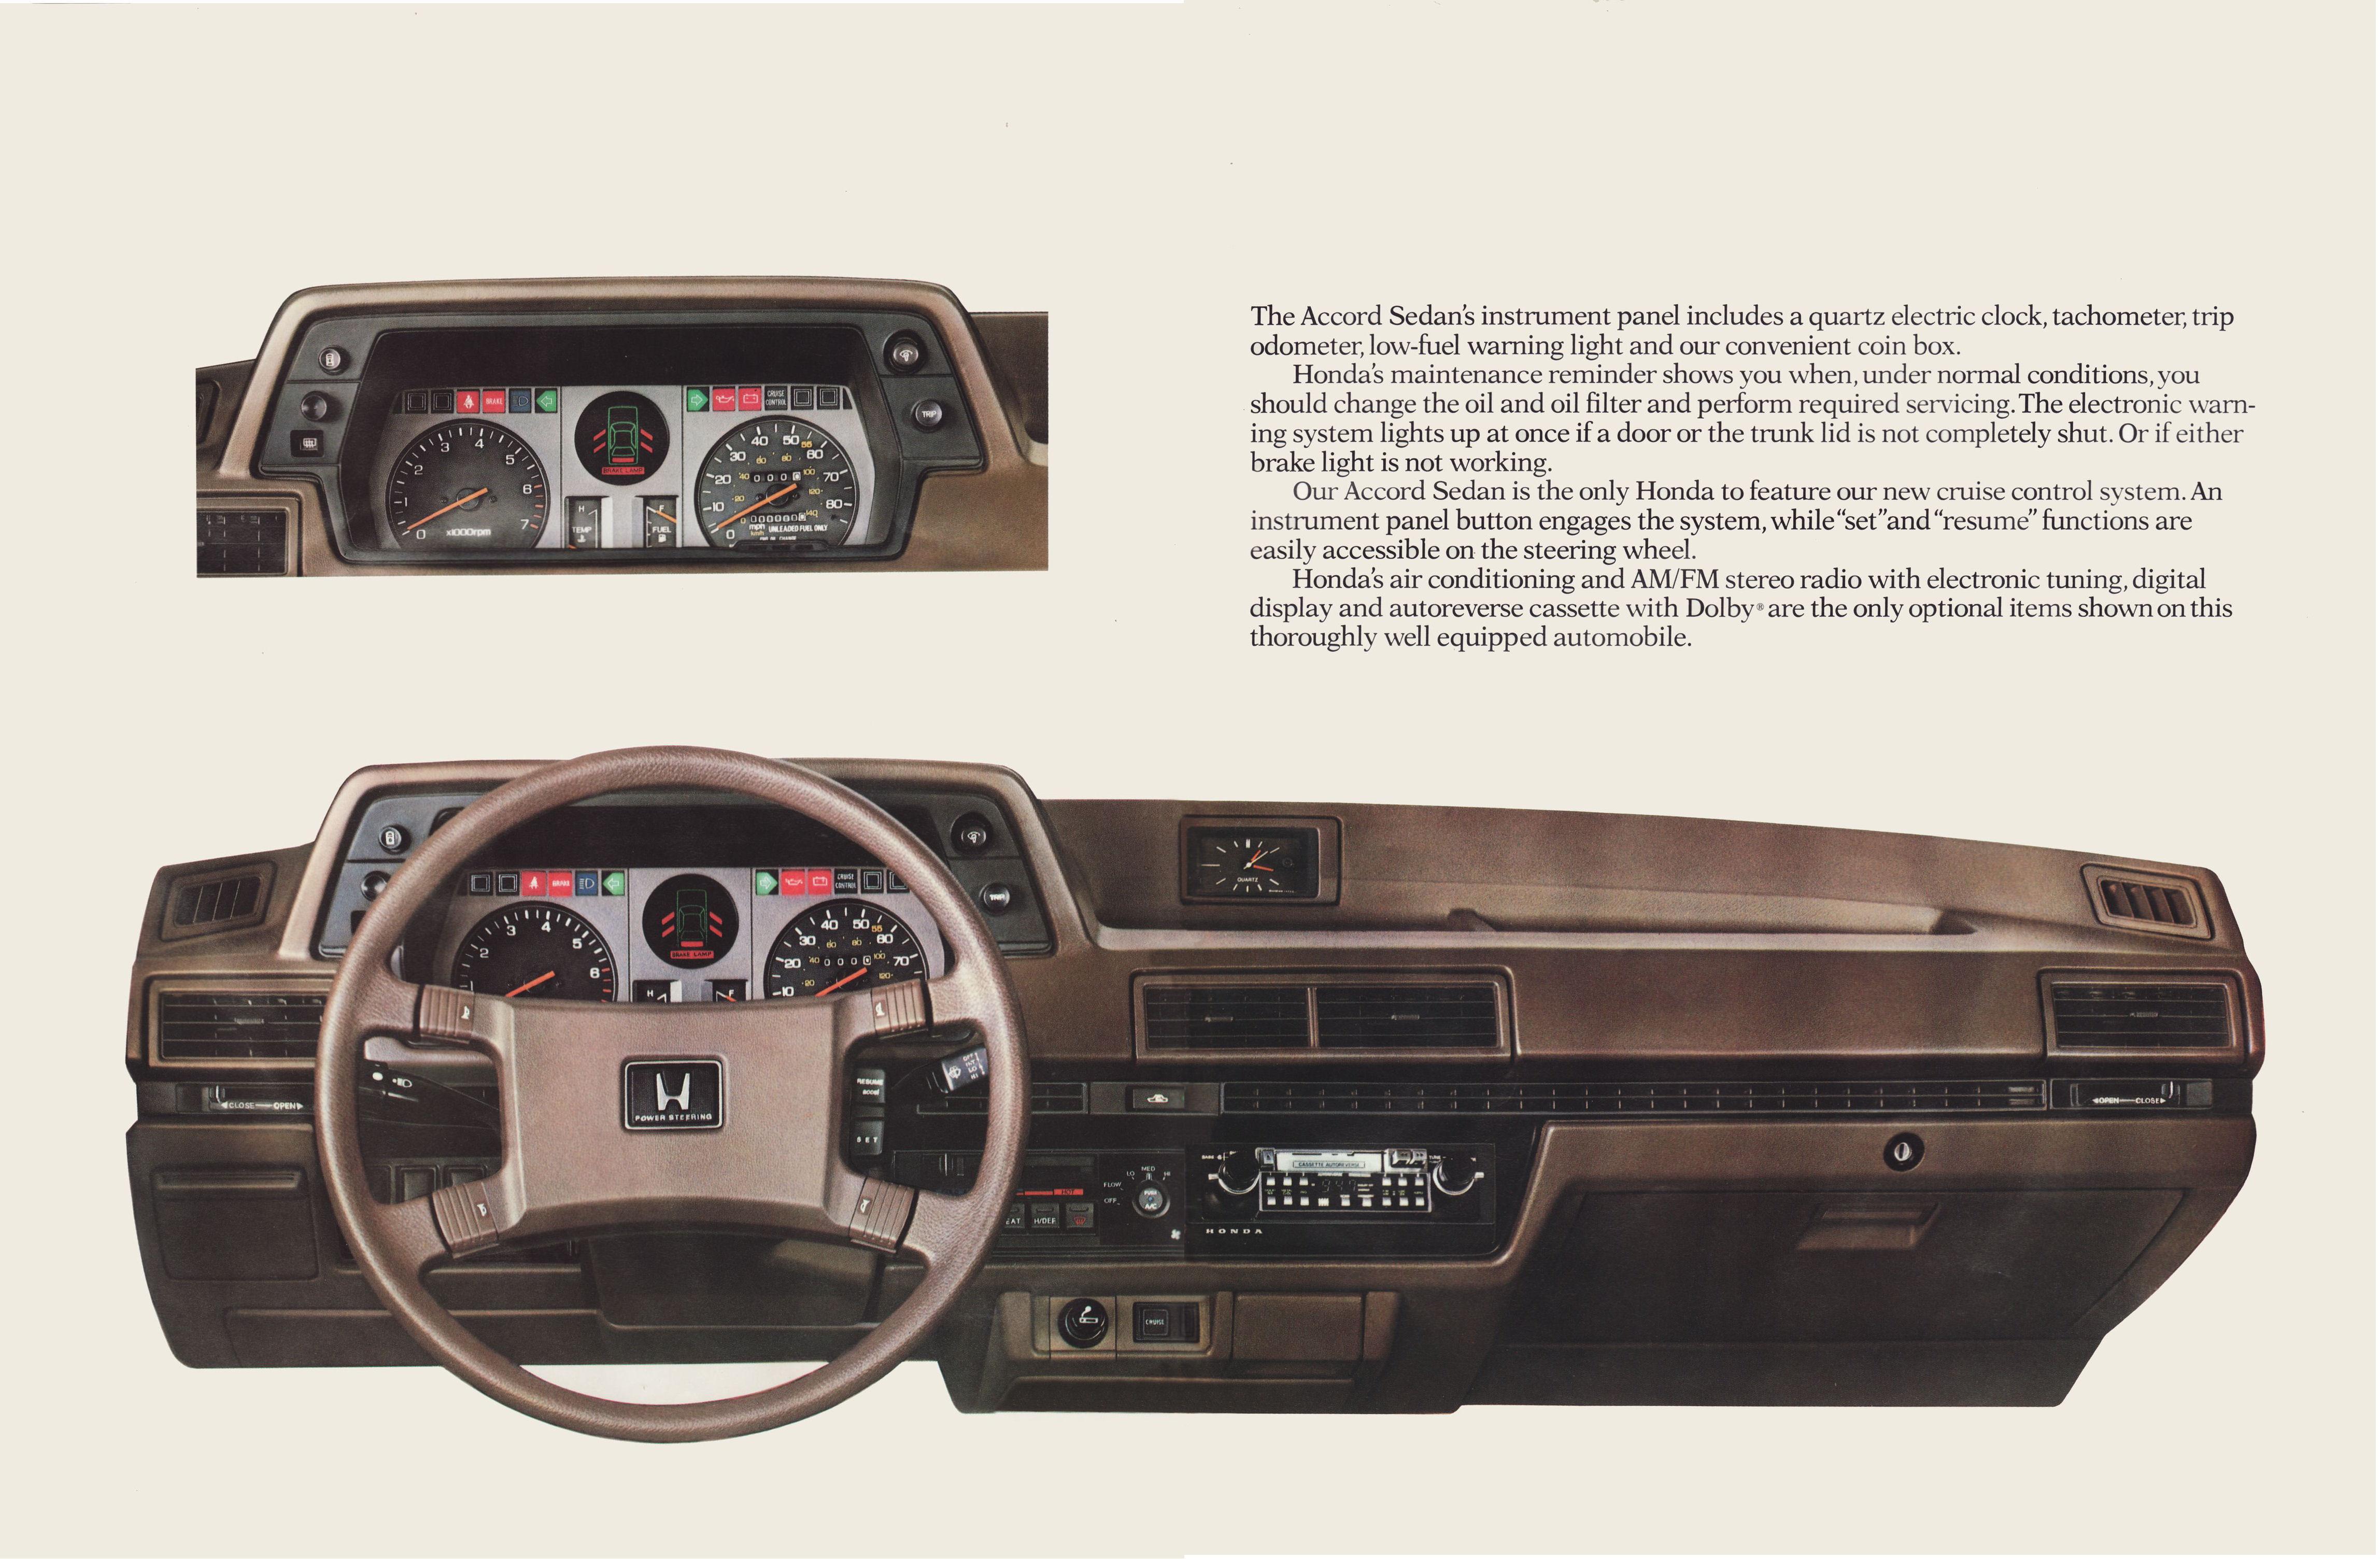 1982 Honda Accord Brochure